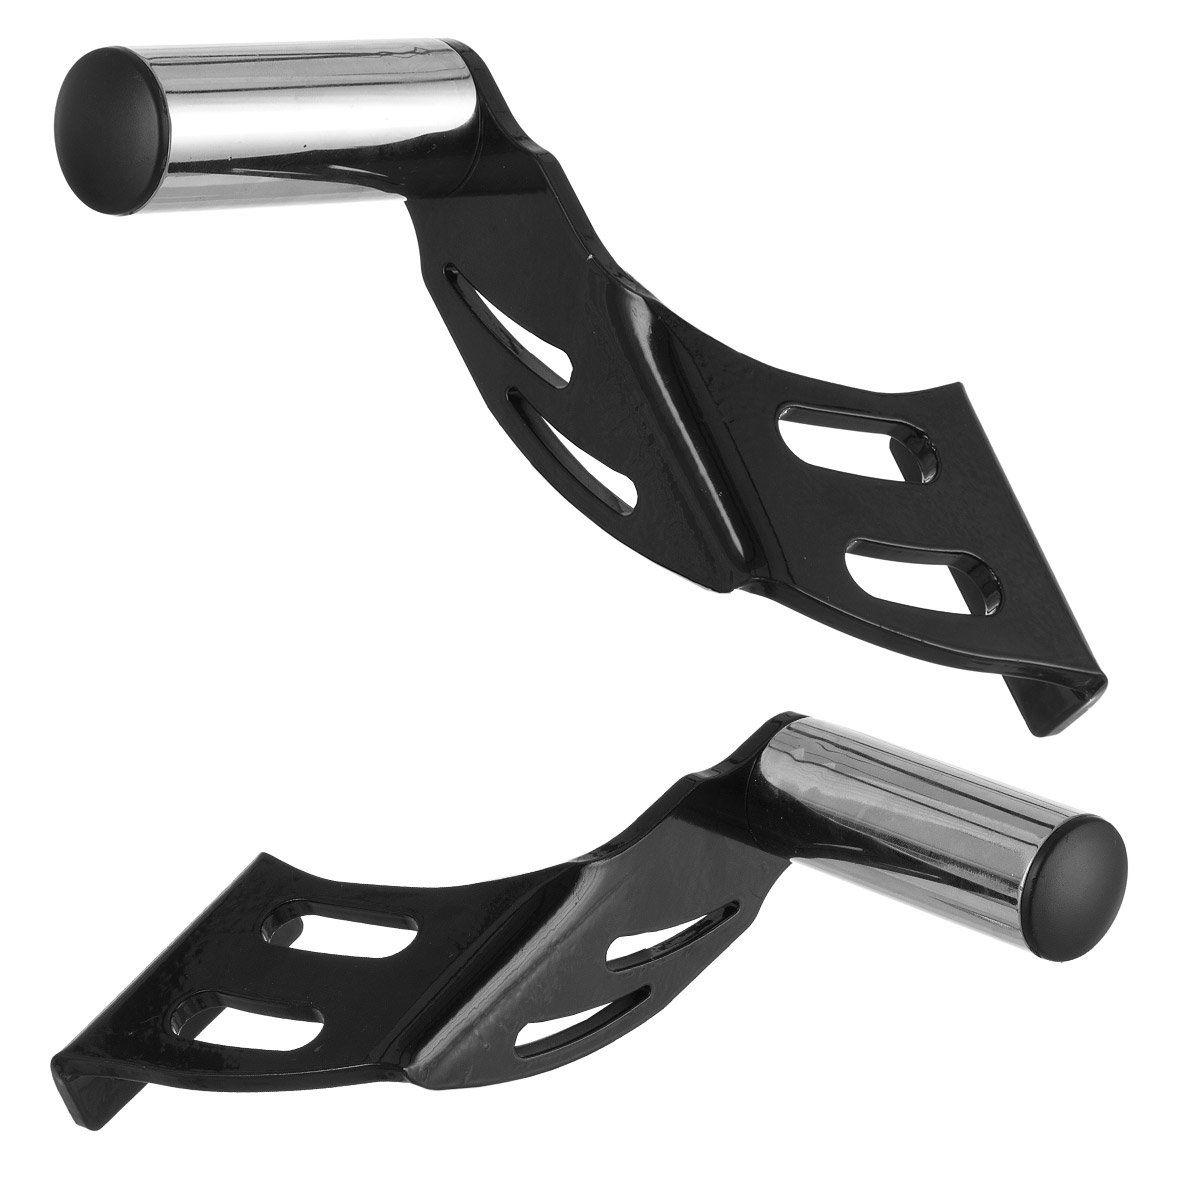 Protetor de Motor Slider para Honda Titan Fan 125 150 1999 À 2017 e YBR 125 / Factor